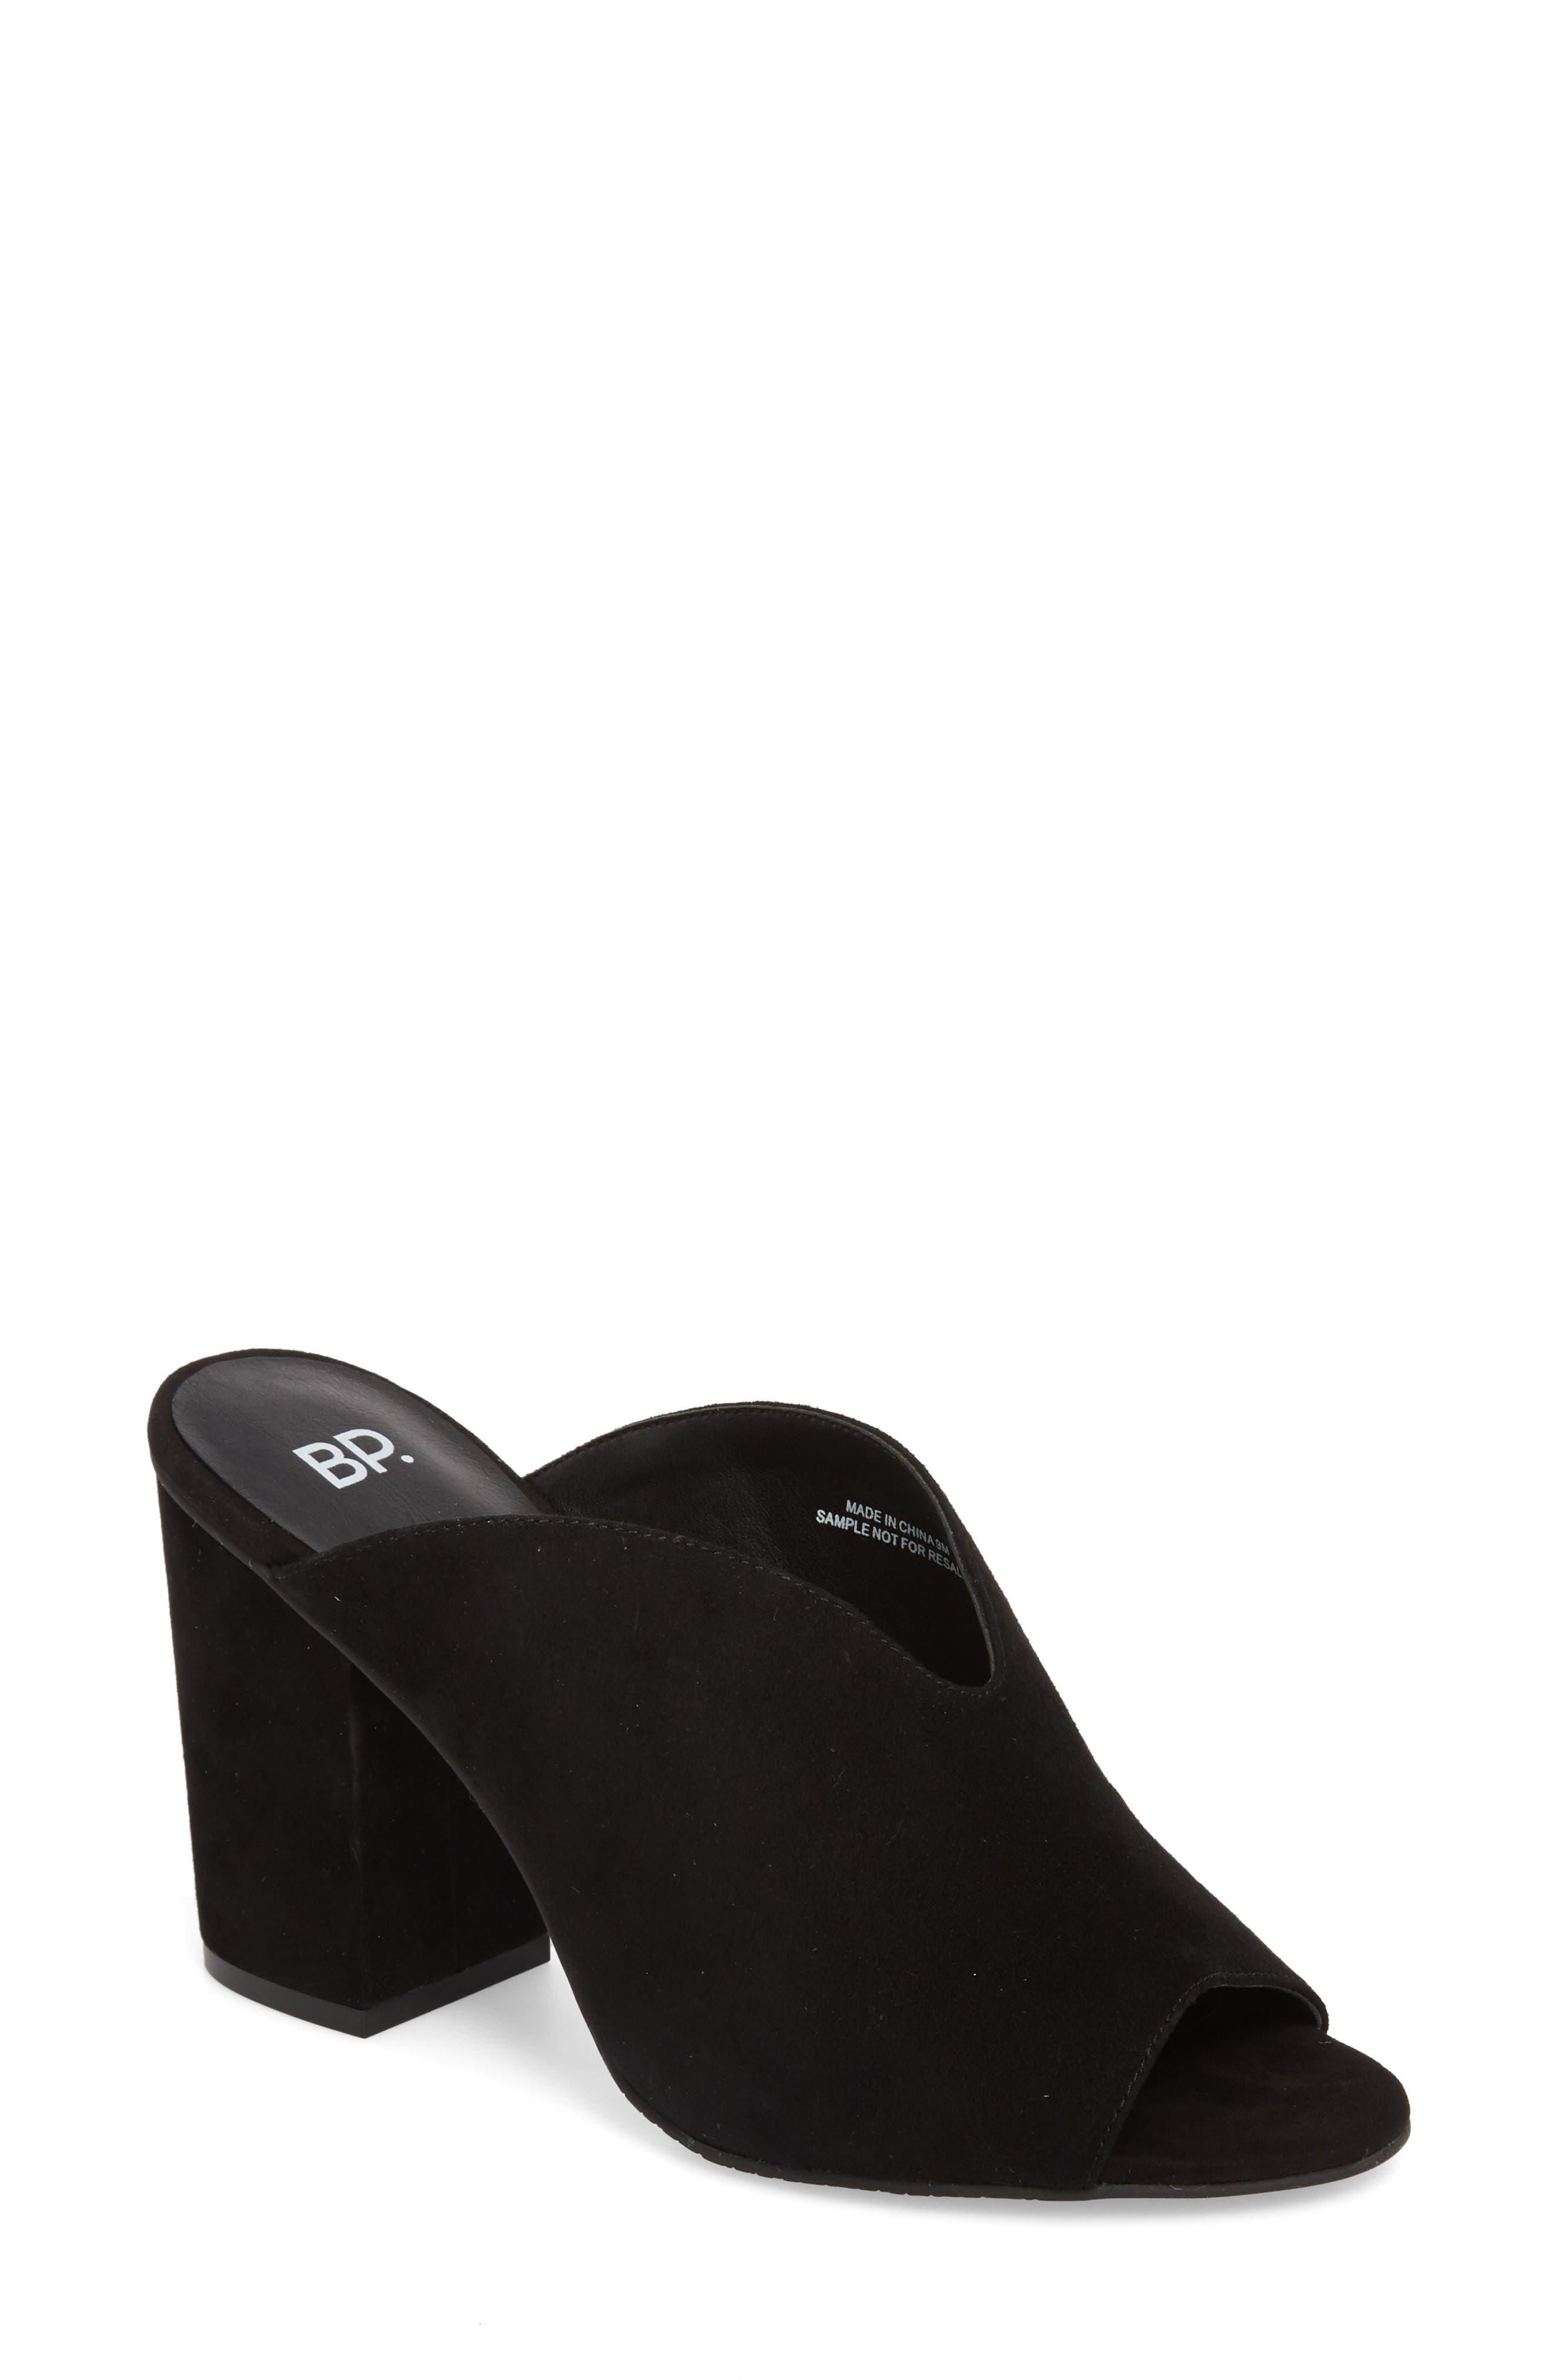 Tonya Open Toe Mule,                         Main,                         color, Black Suede